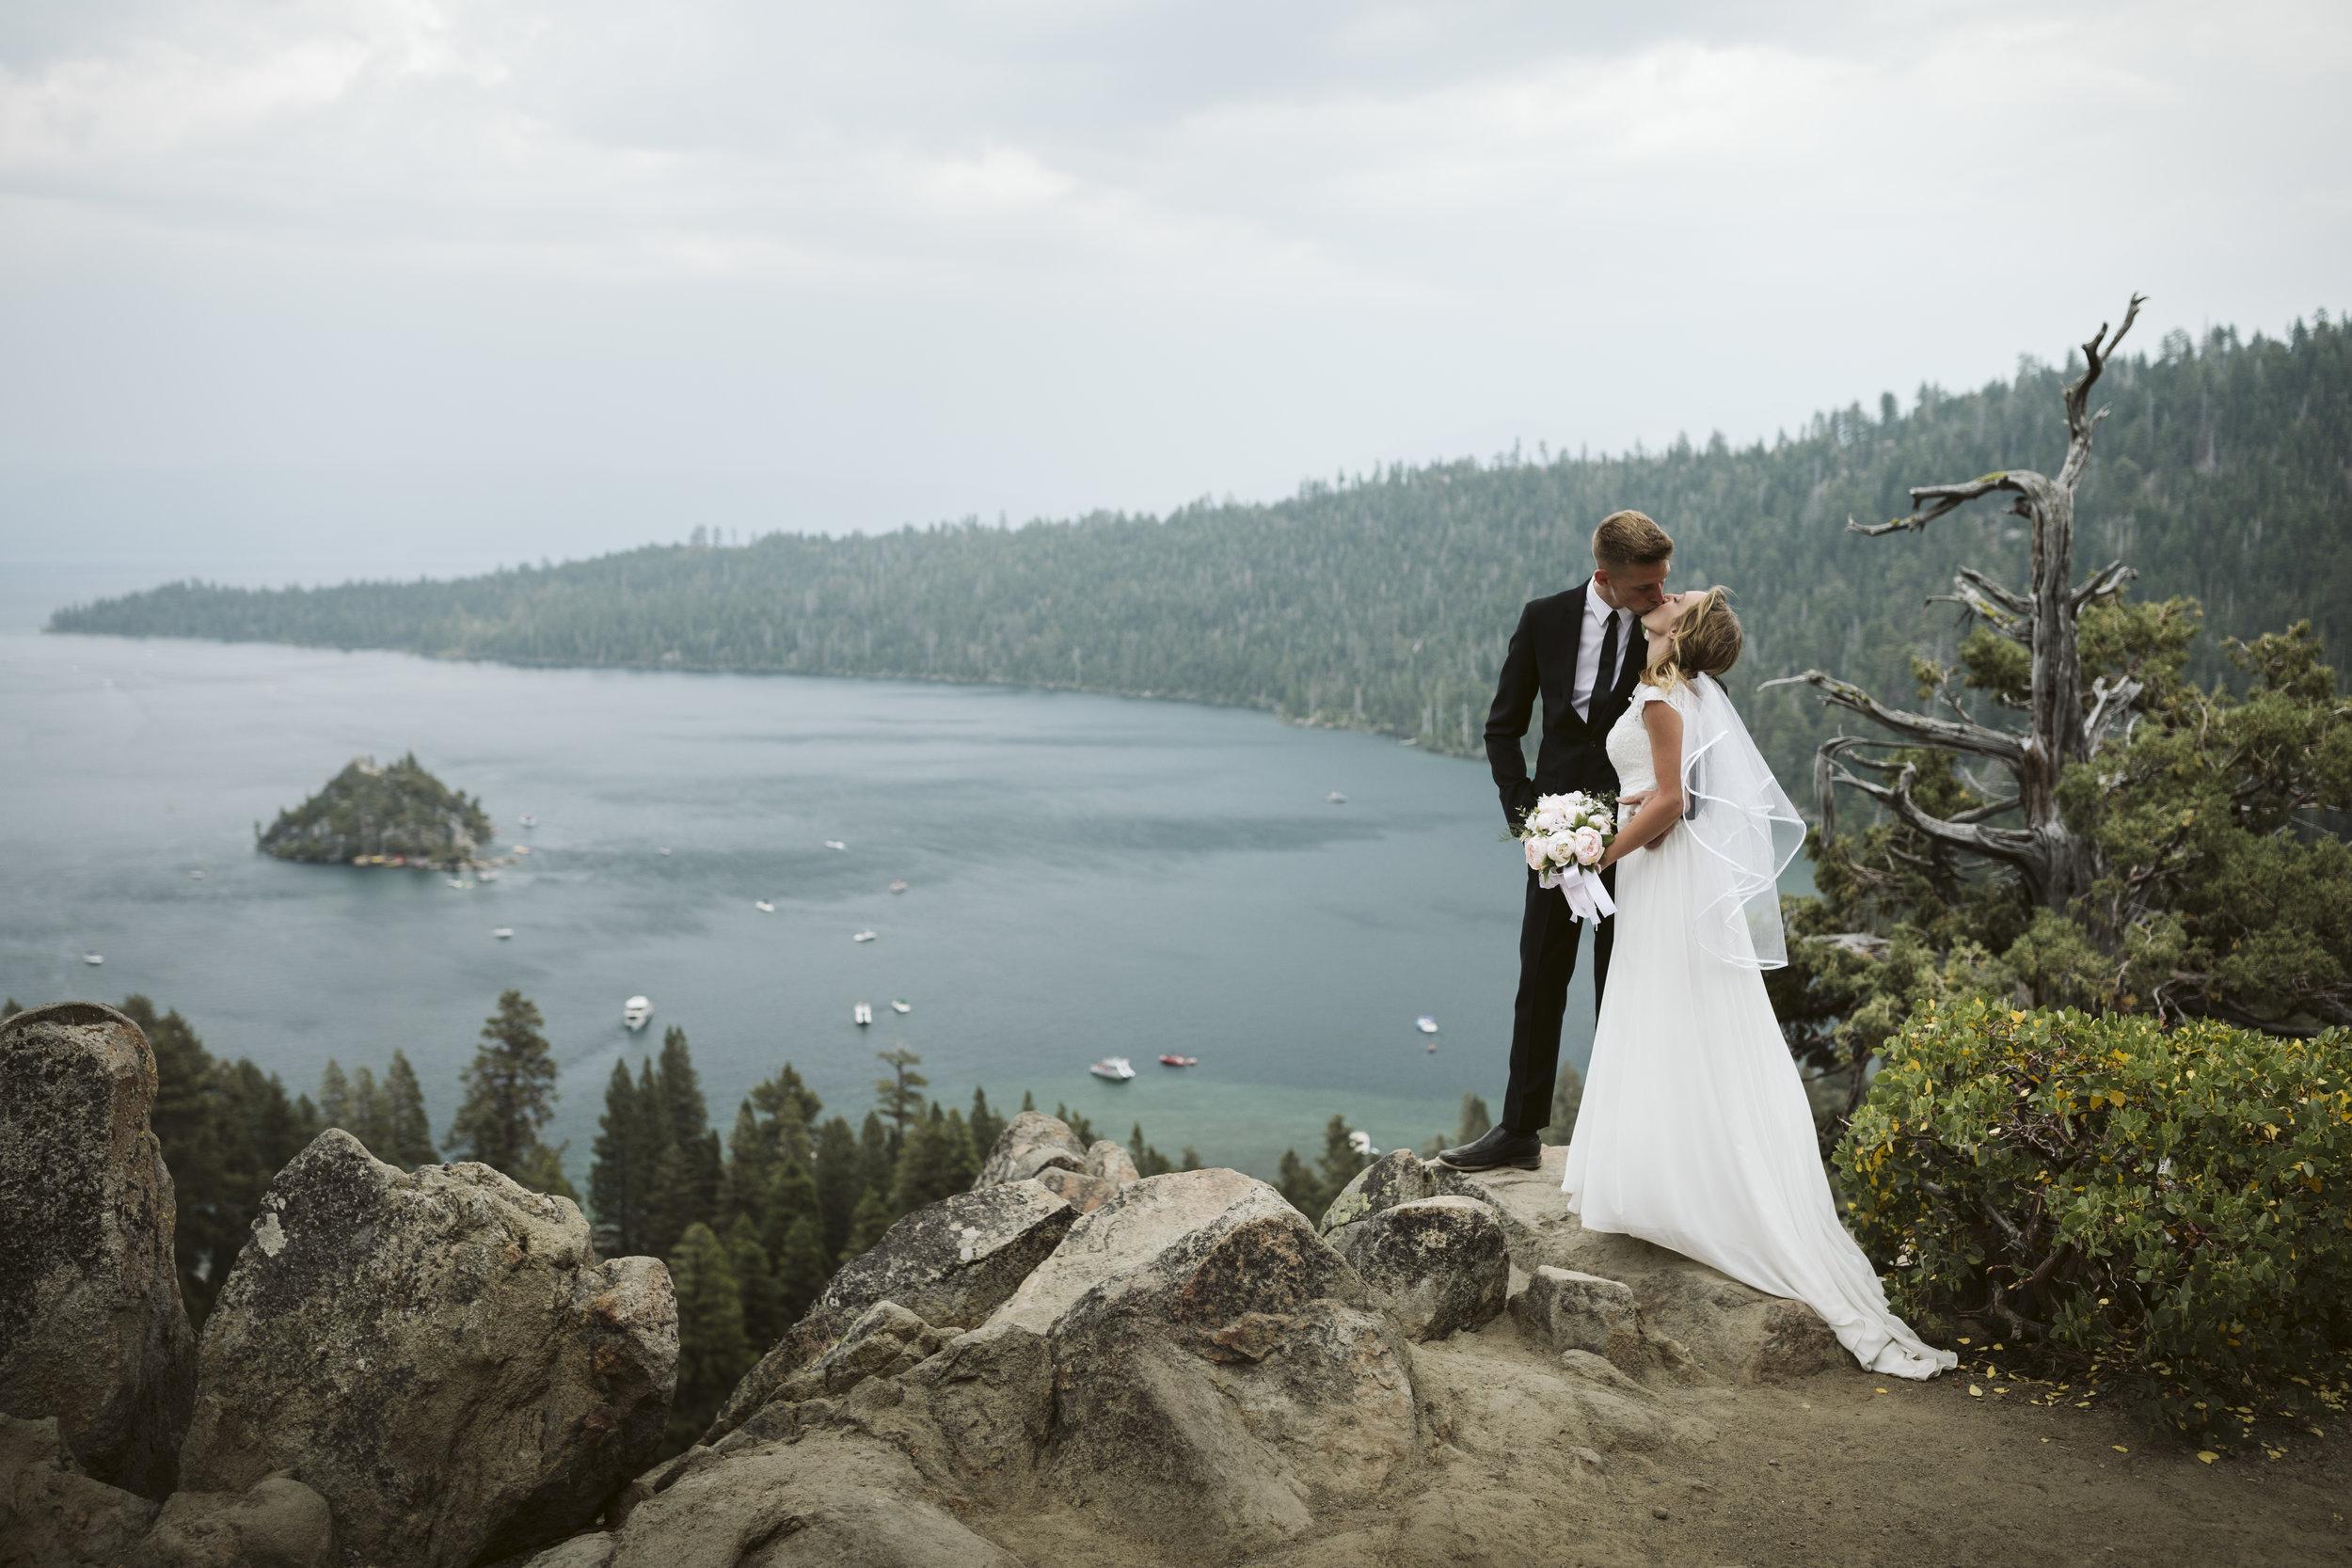 0M7A1024vildphotography-adventurewedding-adventurouswedding-tahoewedding-laketahoewedding-adventureelopement-laketahoeweddingphotographer-wedding-photographer-weddingphotographer-Chase-Sam.jpg